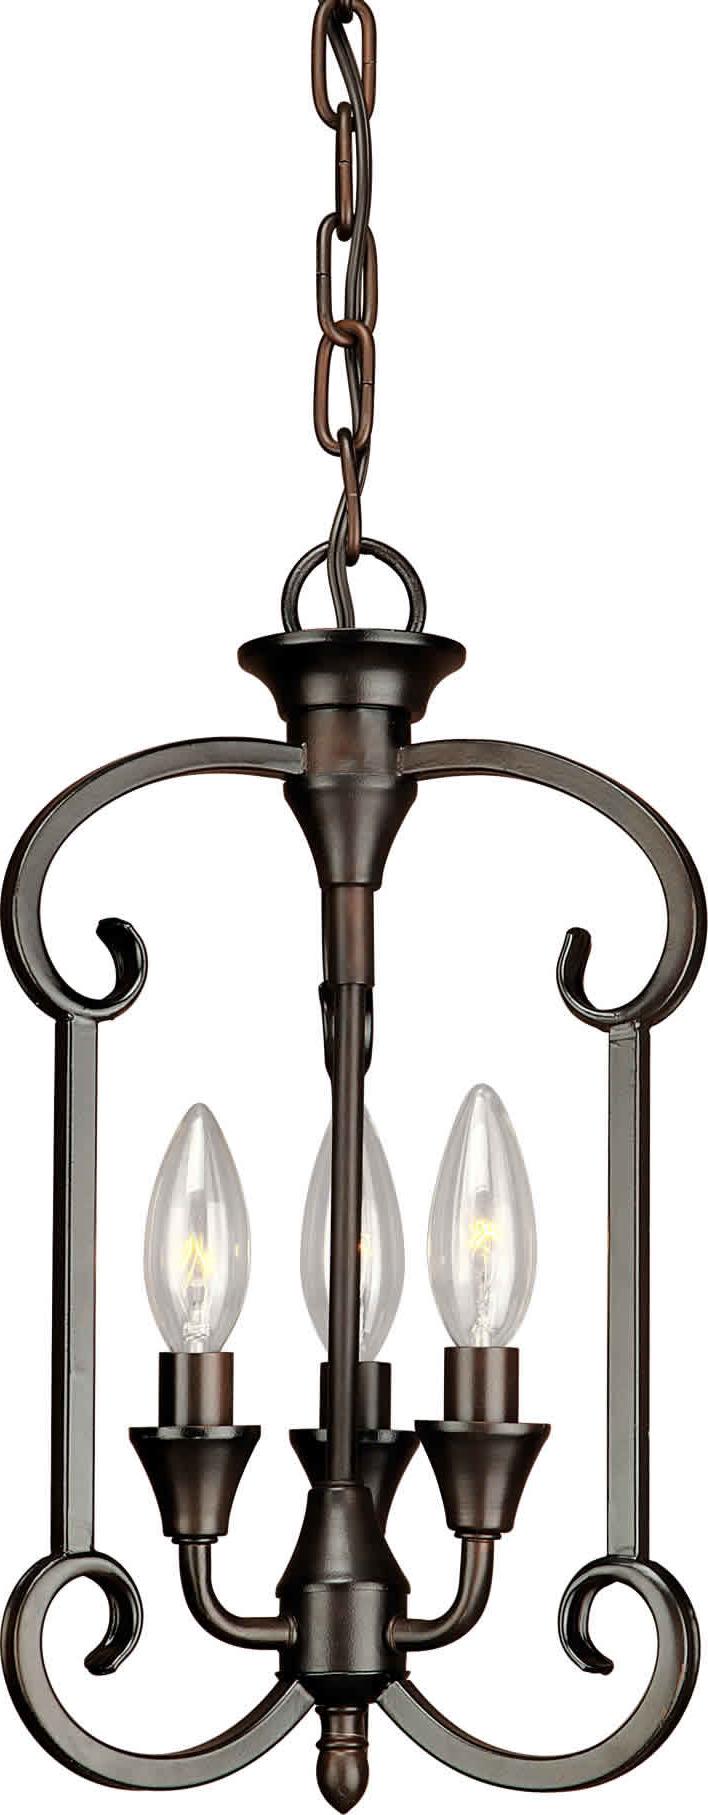 Charlton Home Warner Robins 3 Light Lantern Pendant Regarding Well Liked Warner Robins 3 Light Lantern Pendants (View 3 of 20)